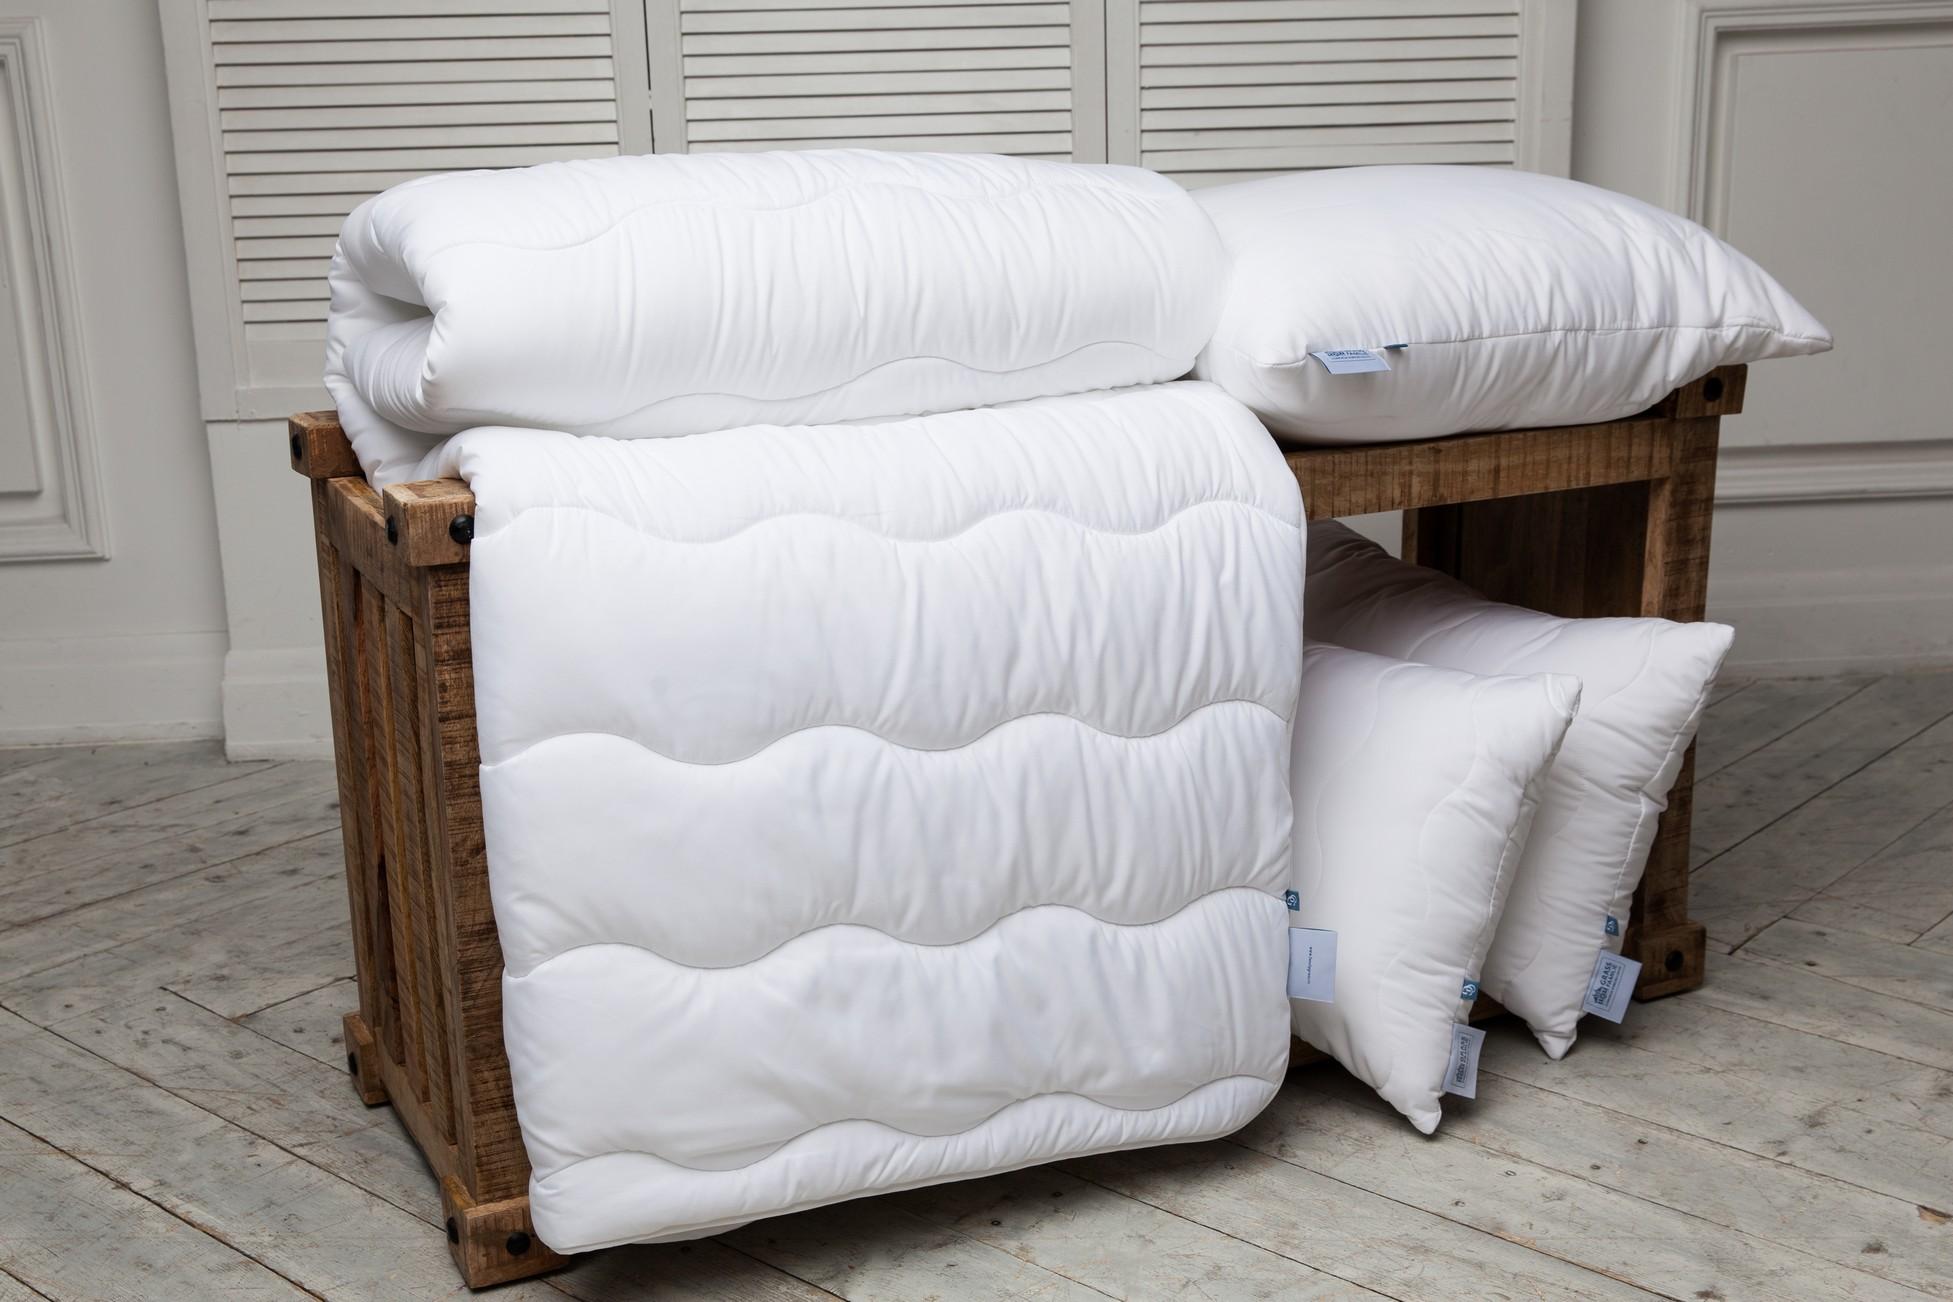 Одеяло Edana Всесезонное (140х205 см) фото